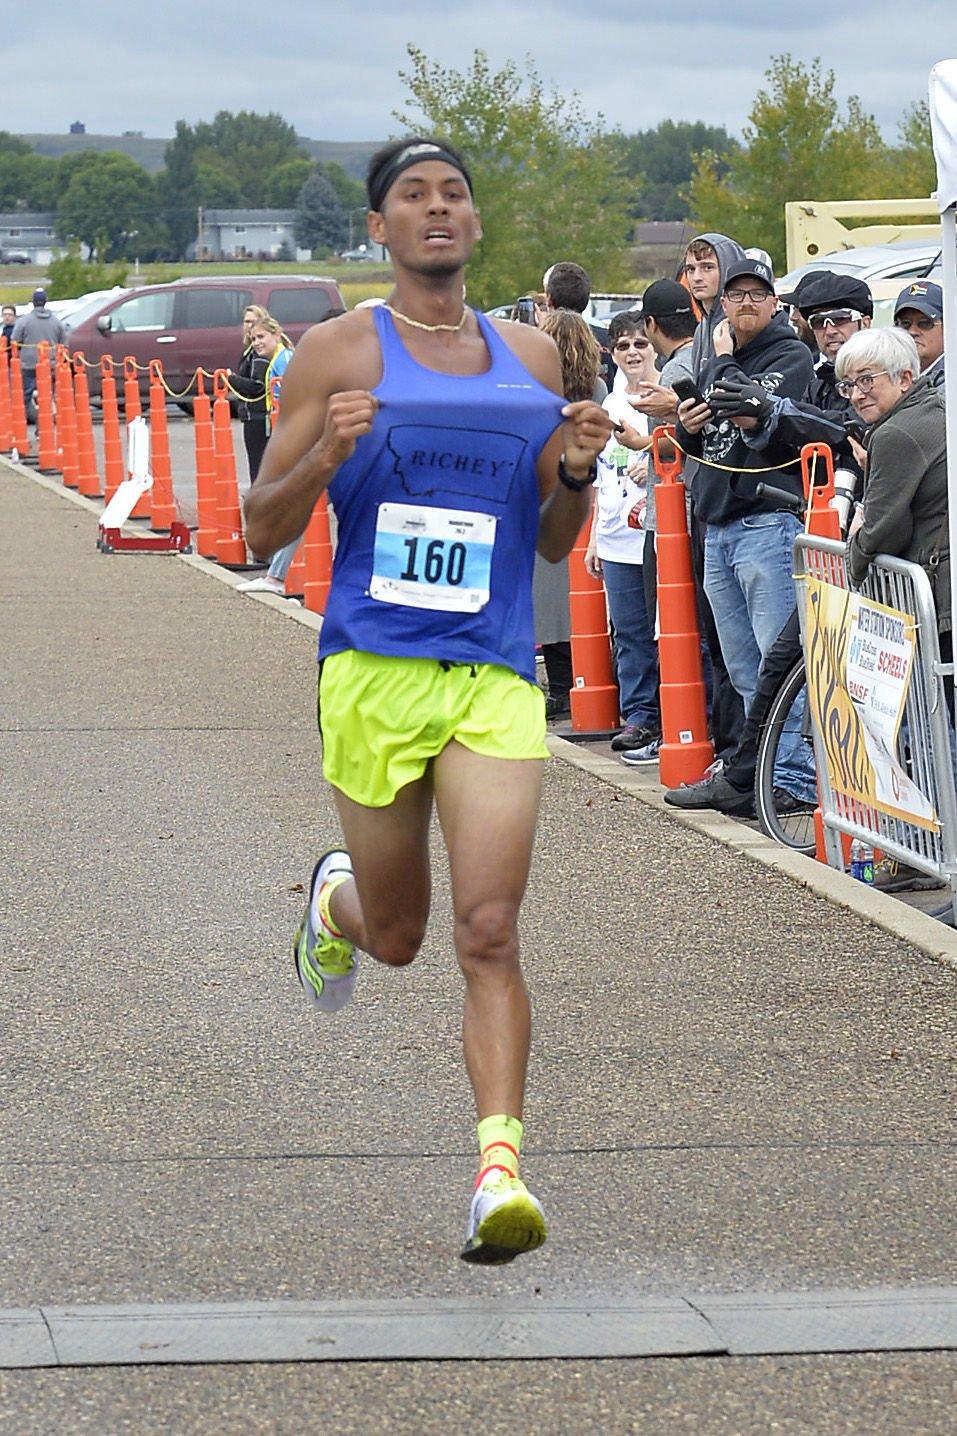 092219-nws-Marathon-02